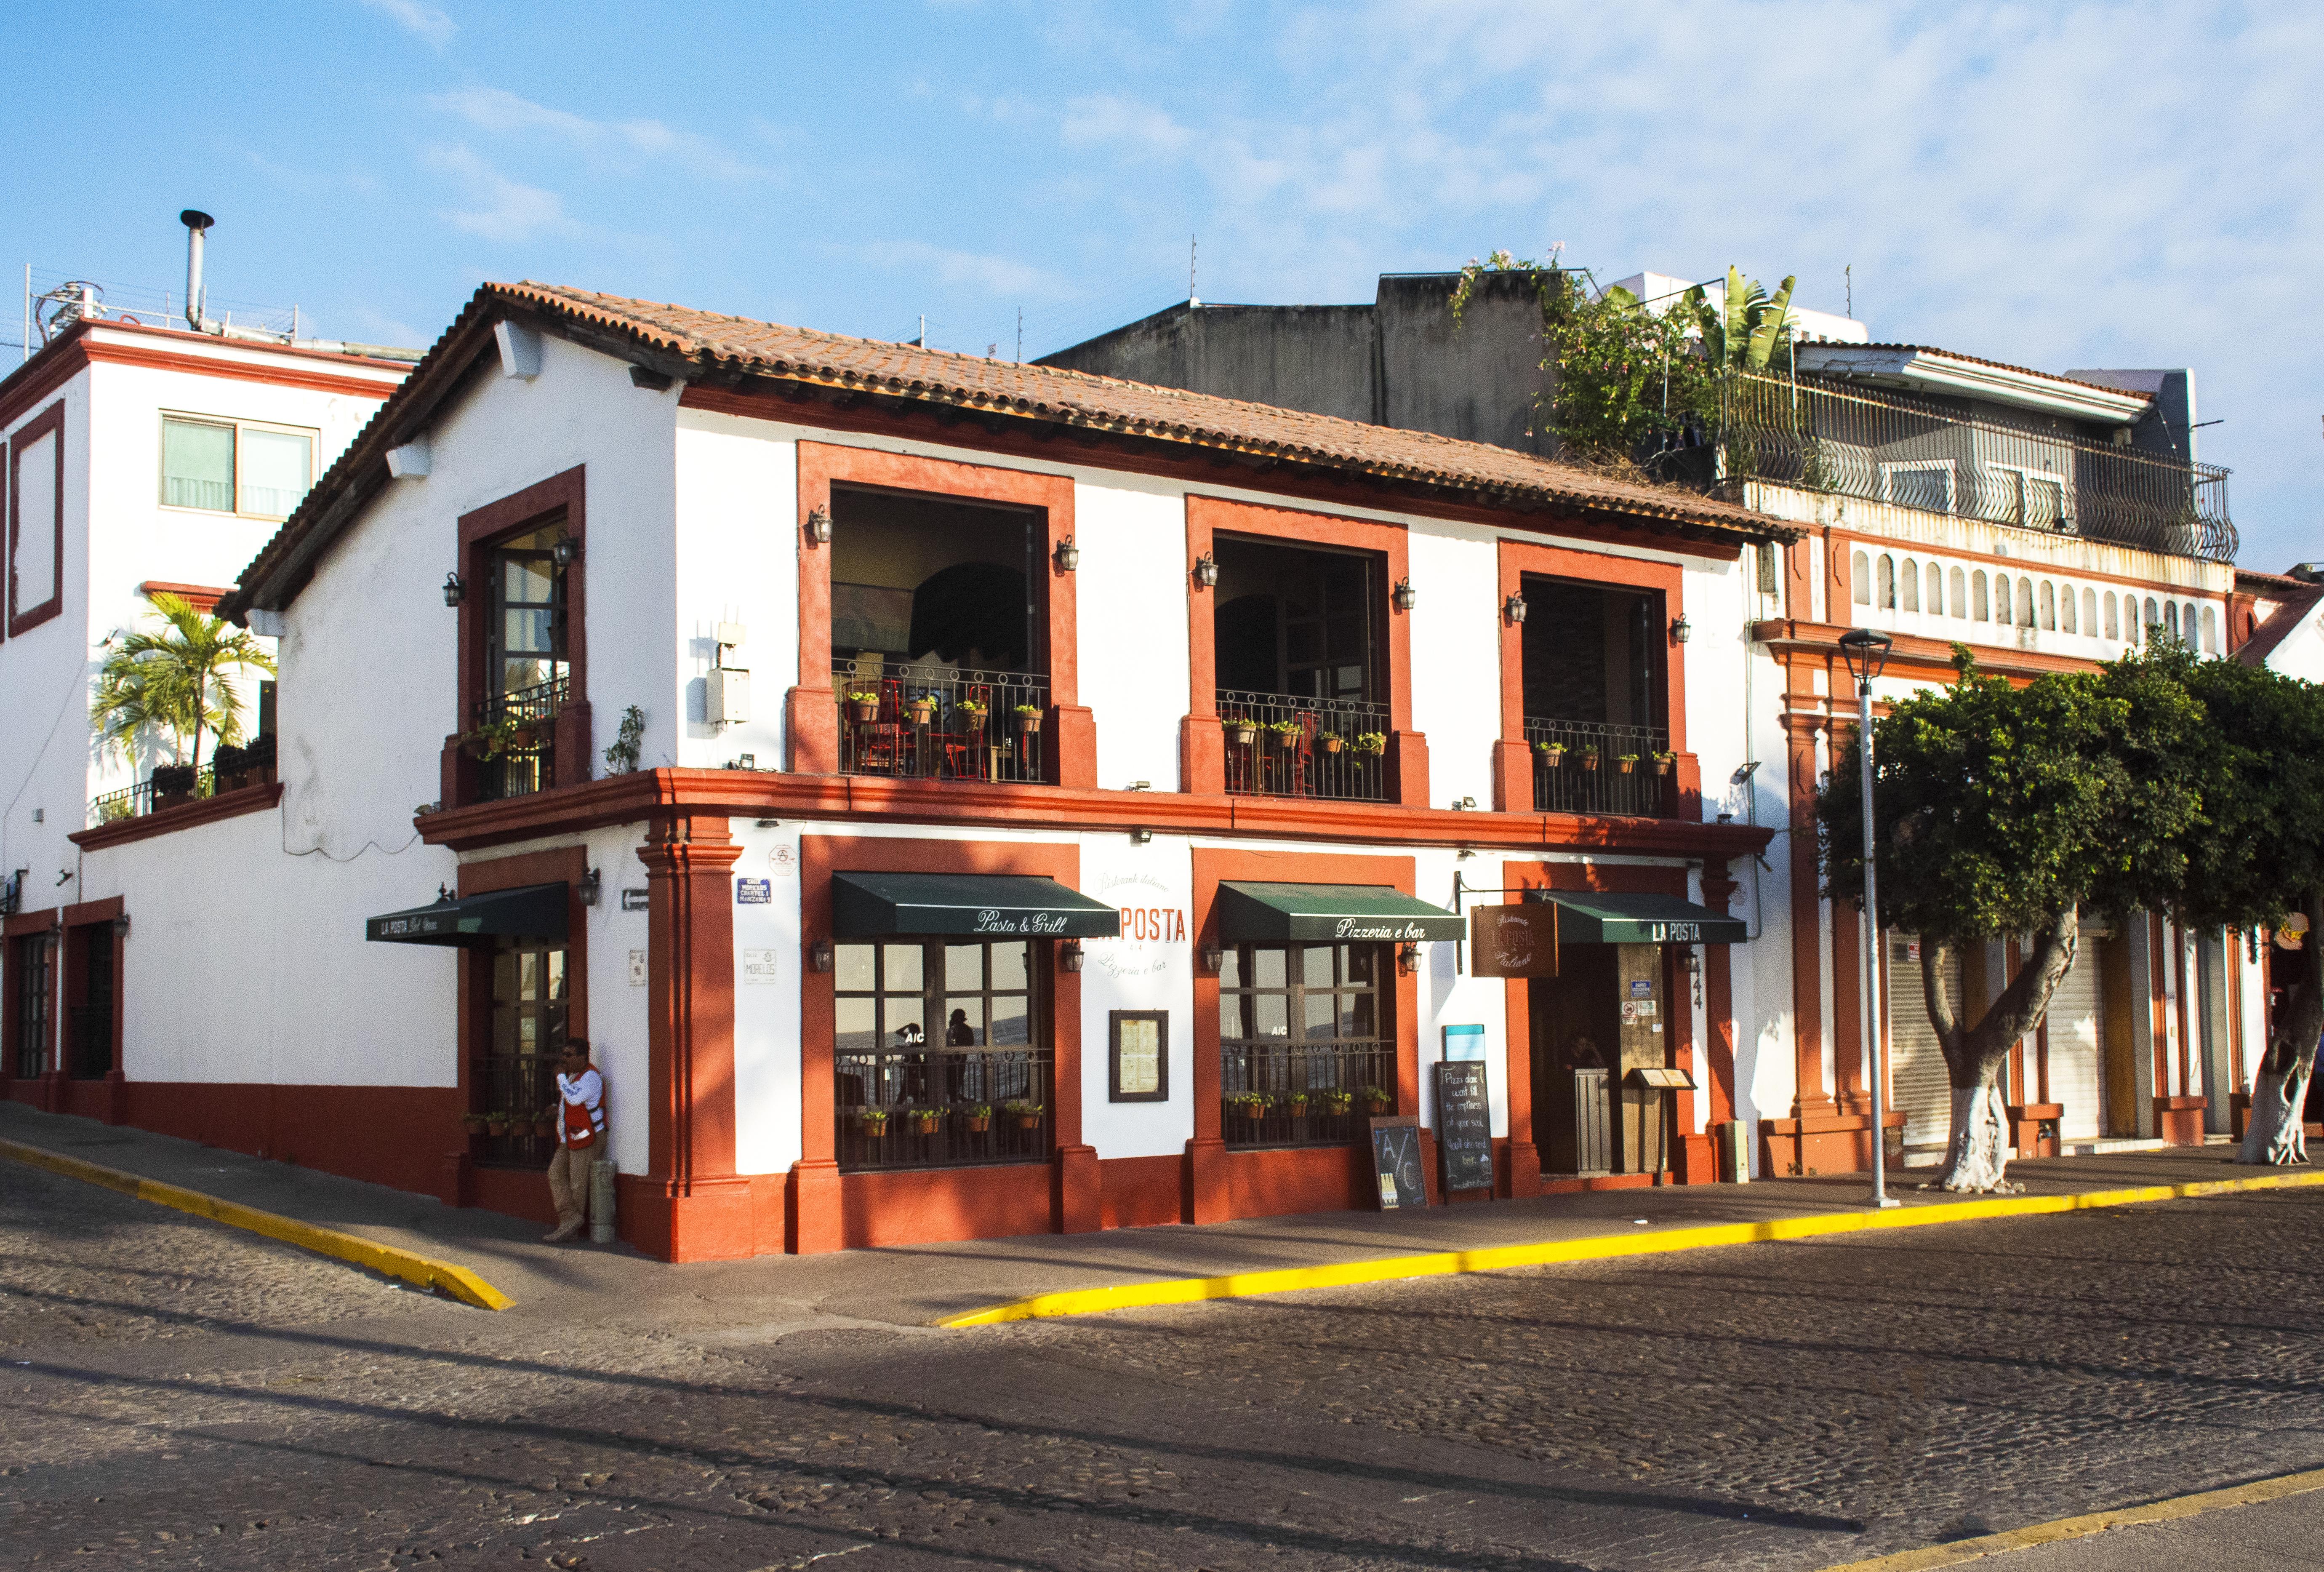 Historia de la arquitectura de Puerto Vallarta – Parte I